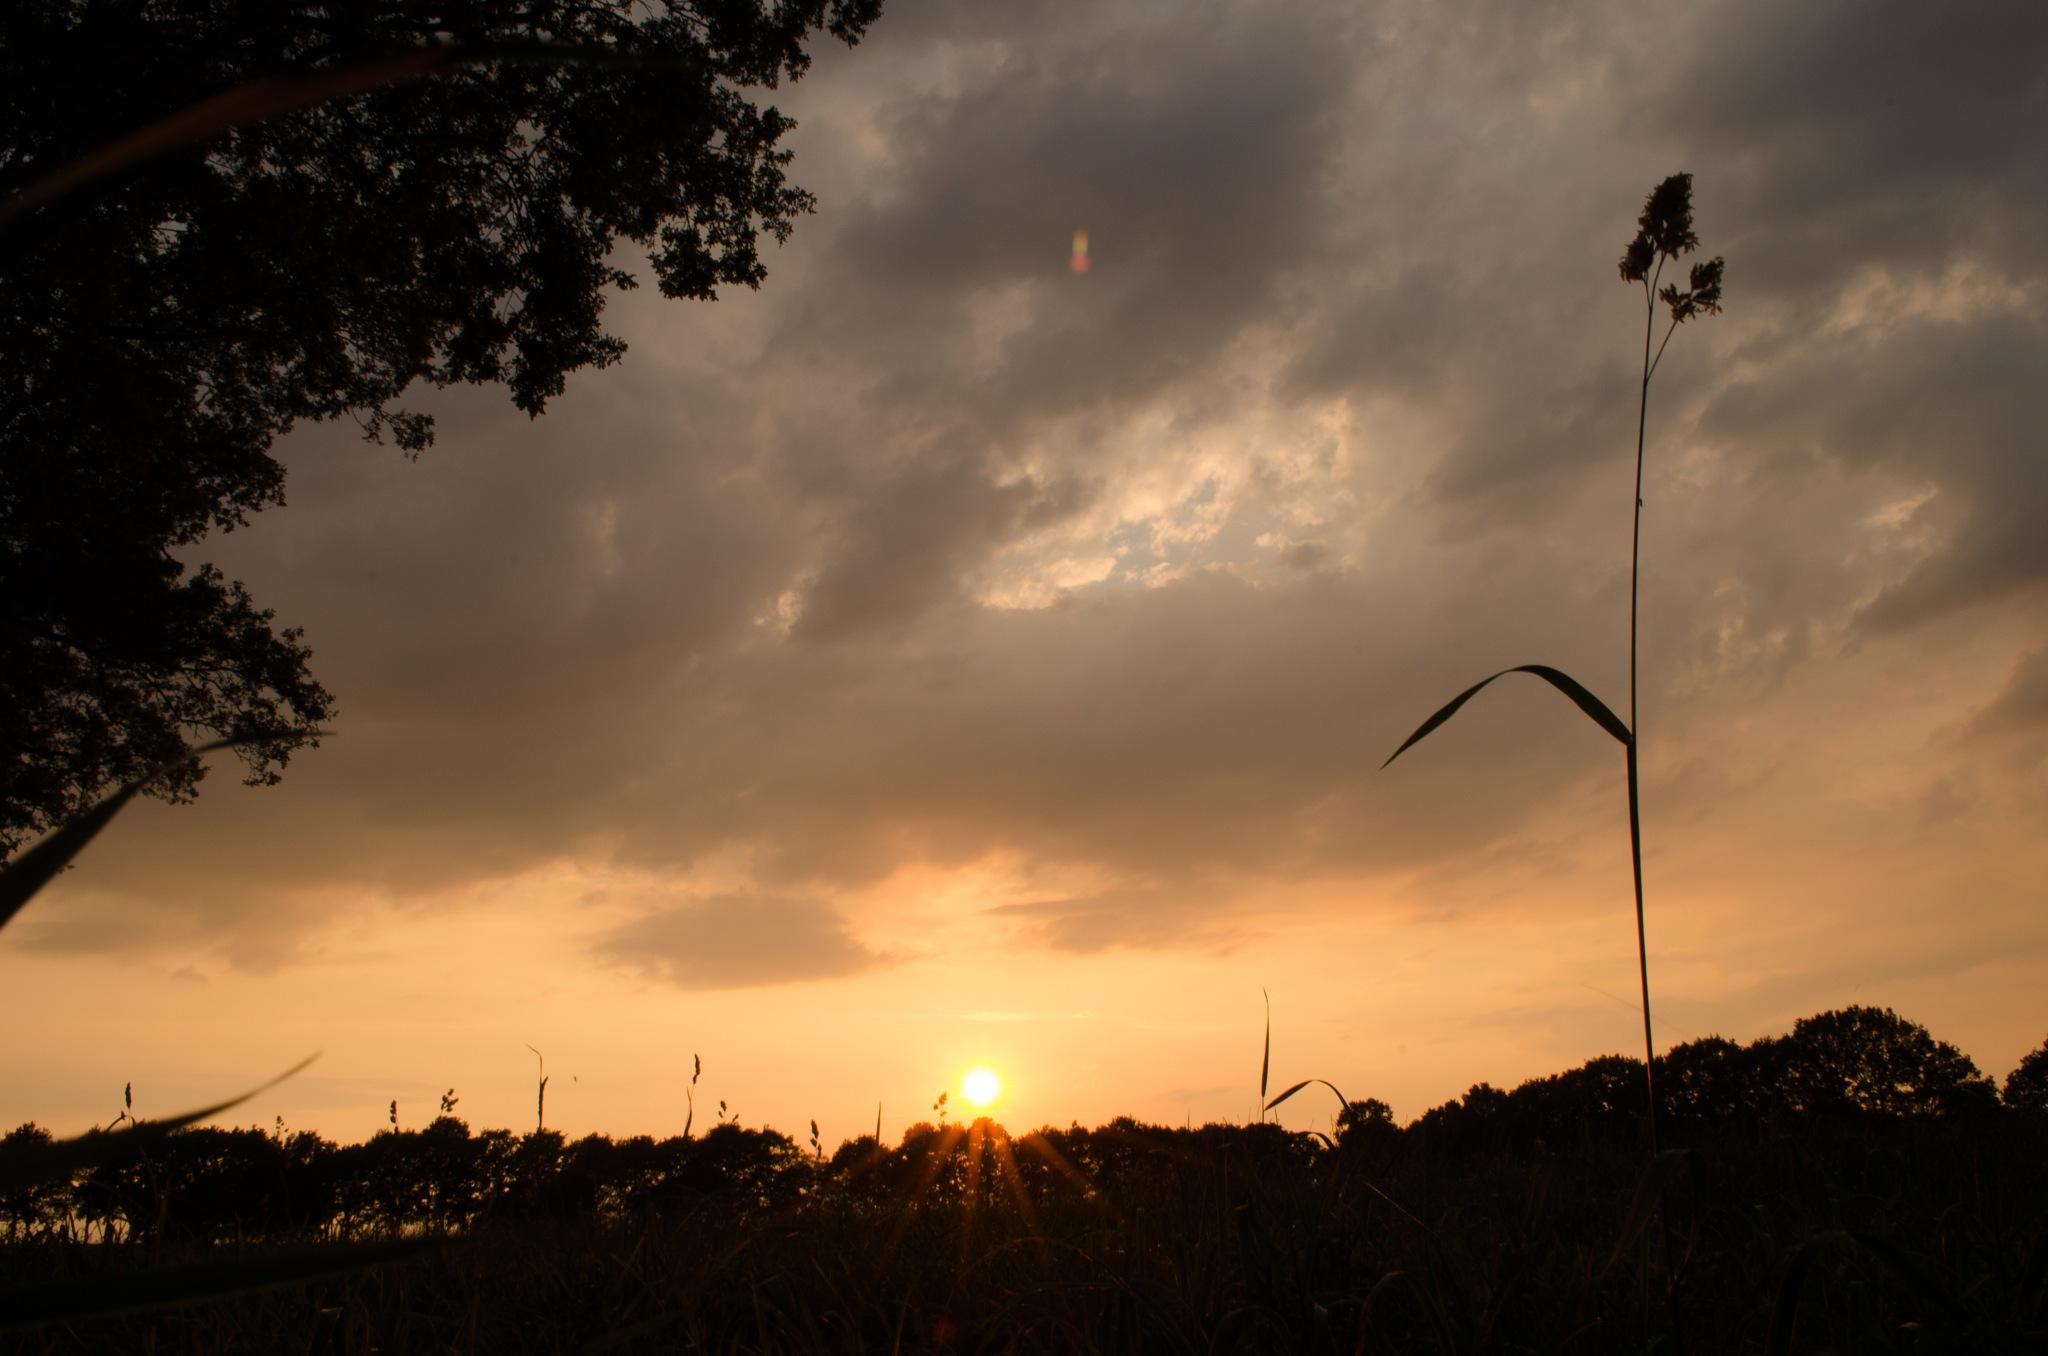 2018-07-31-5 - sunset by Gerard de Haan